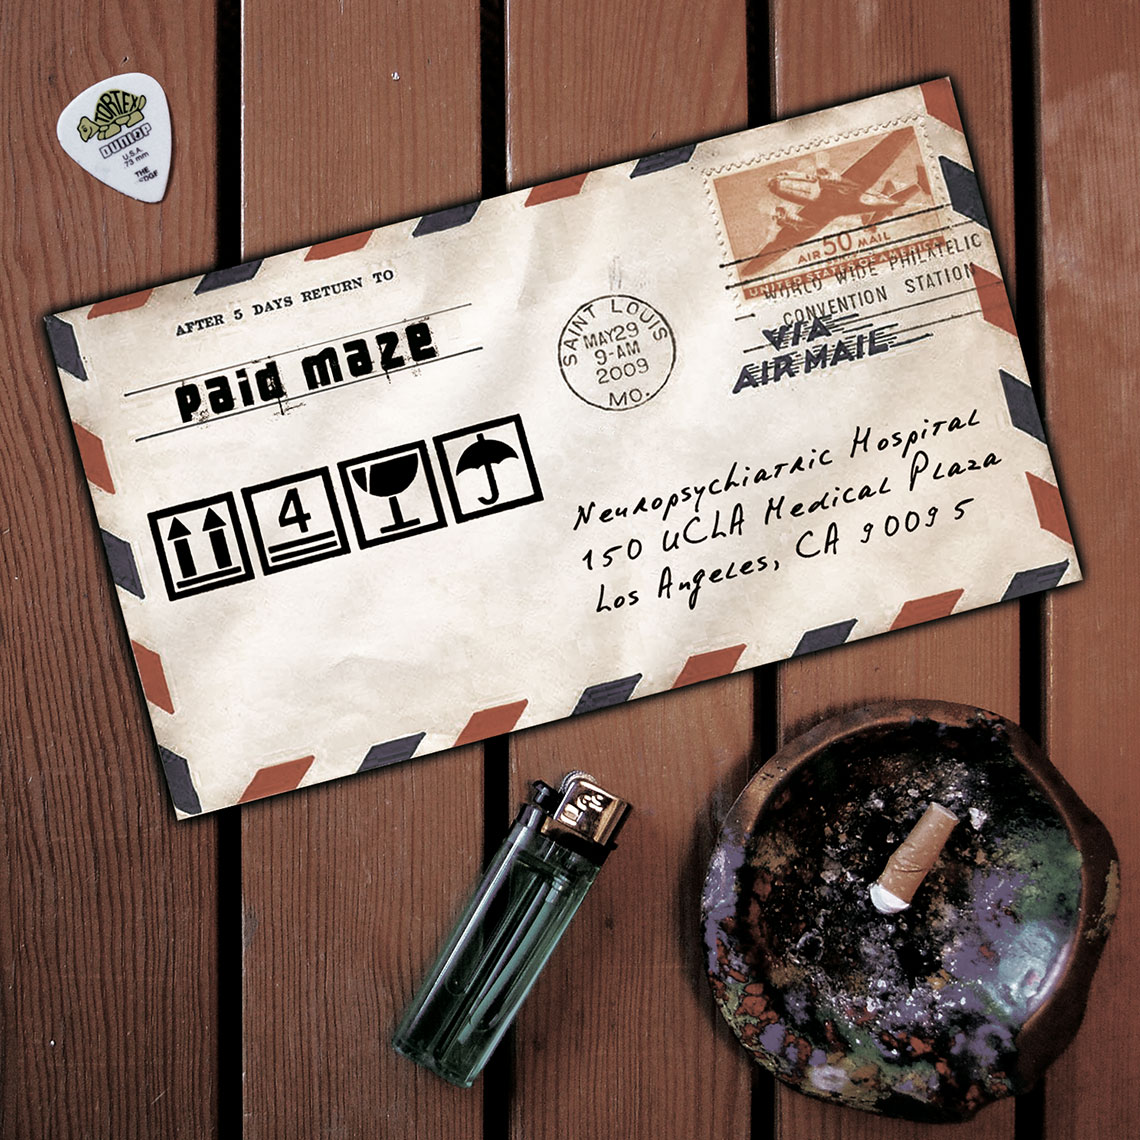 Paid Maze Album Fragile Good